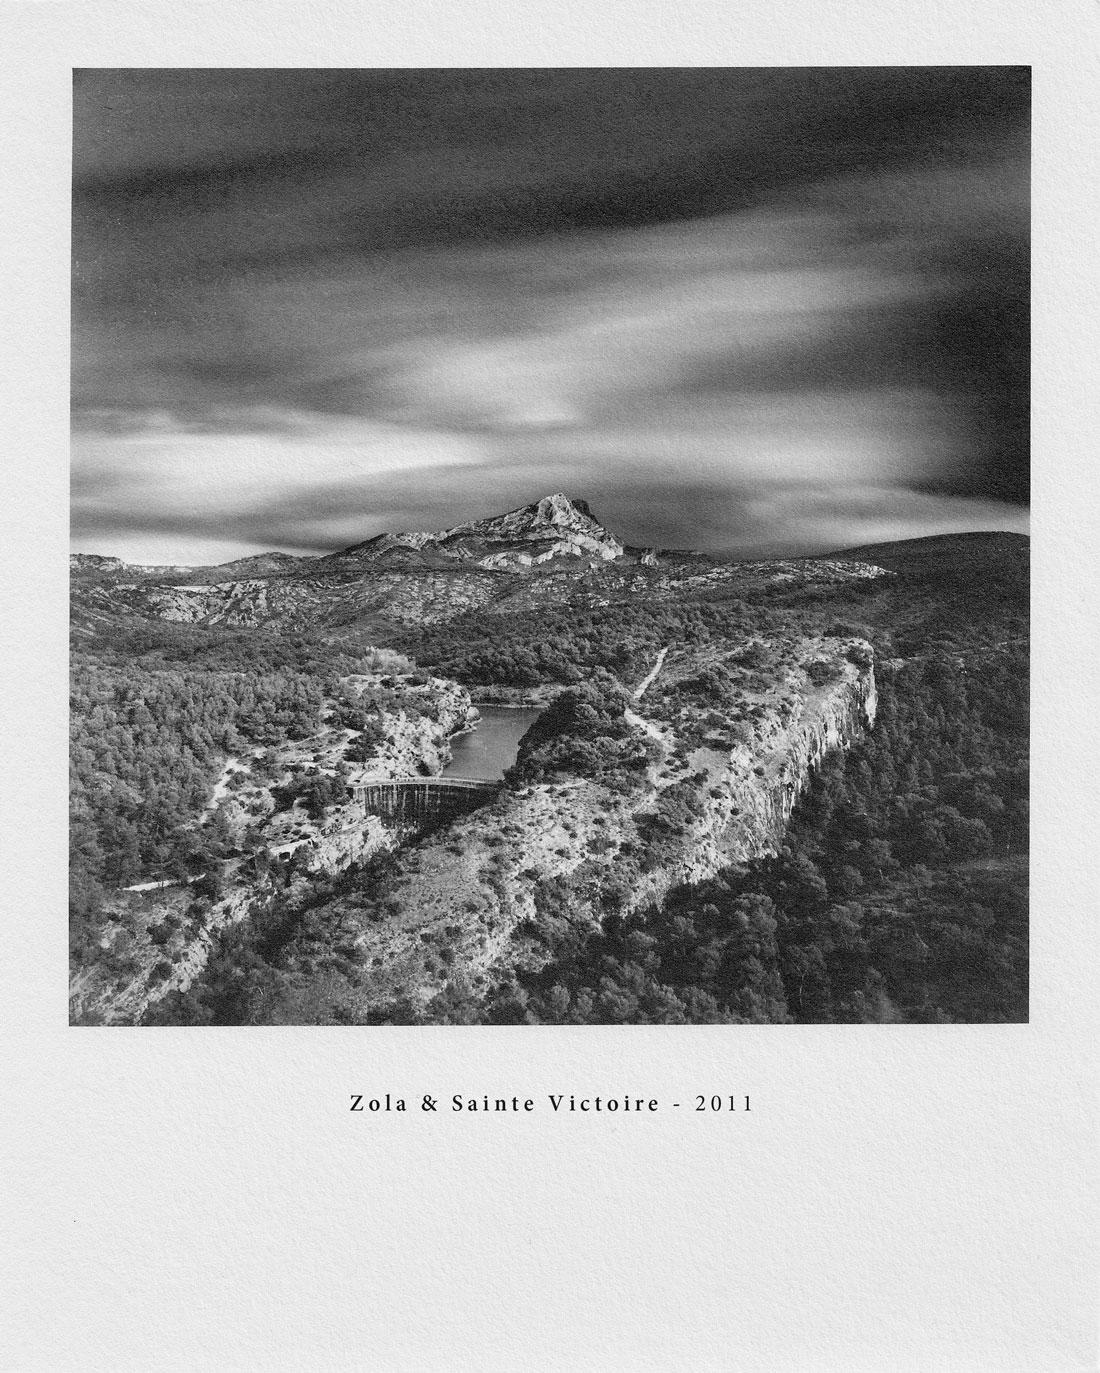 07-Zola-&-Sainte-Victoire